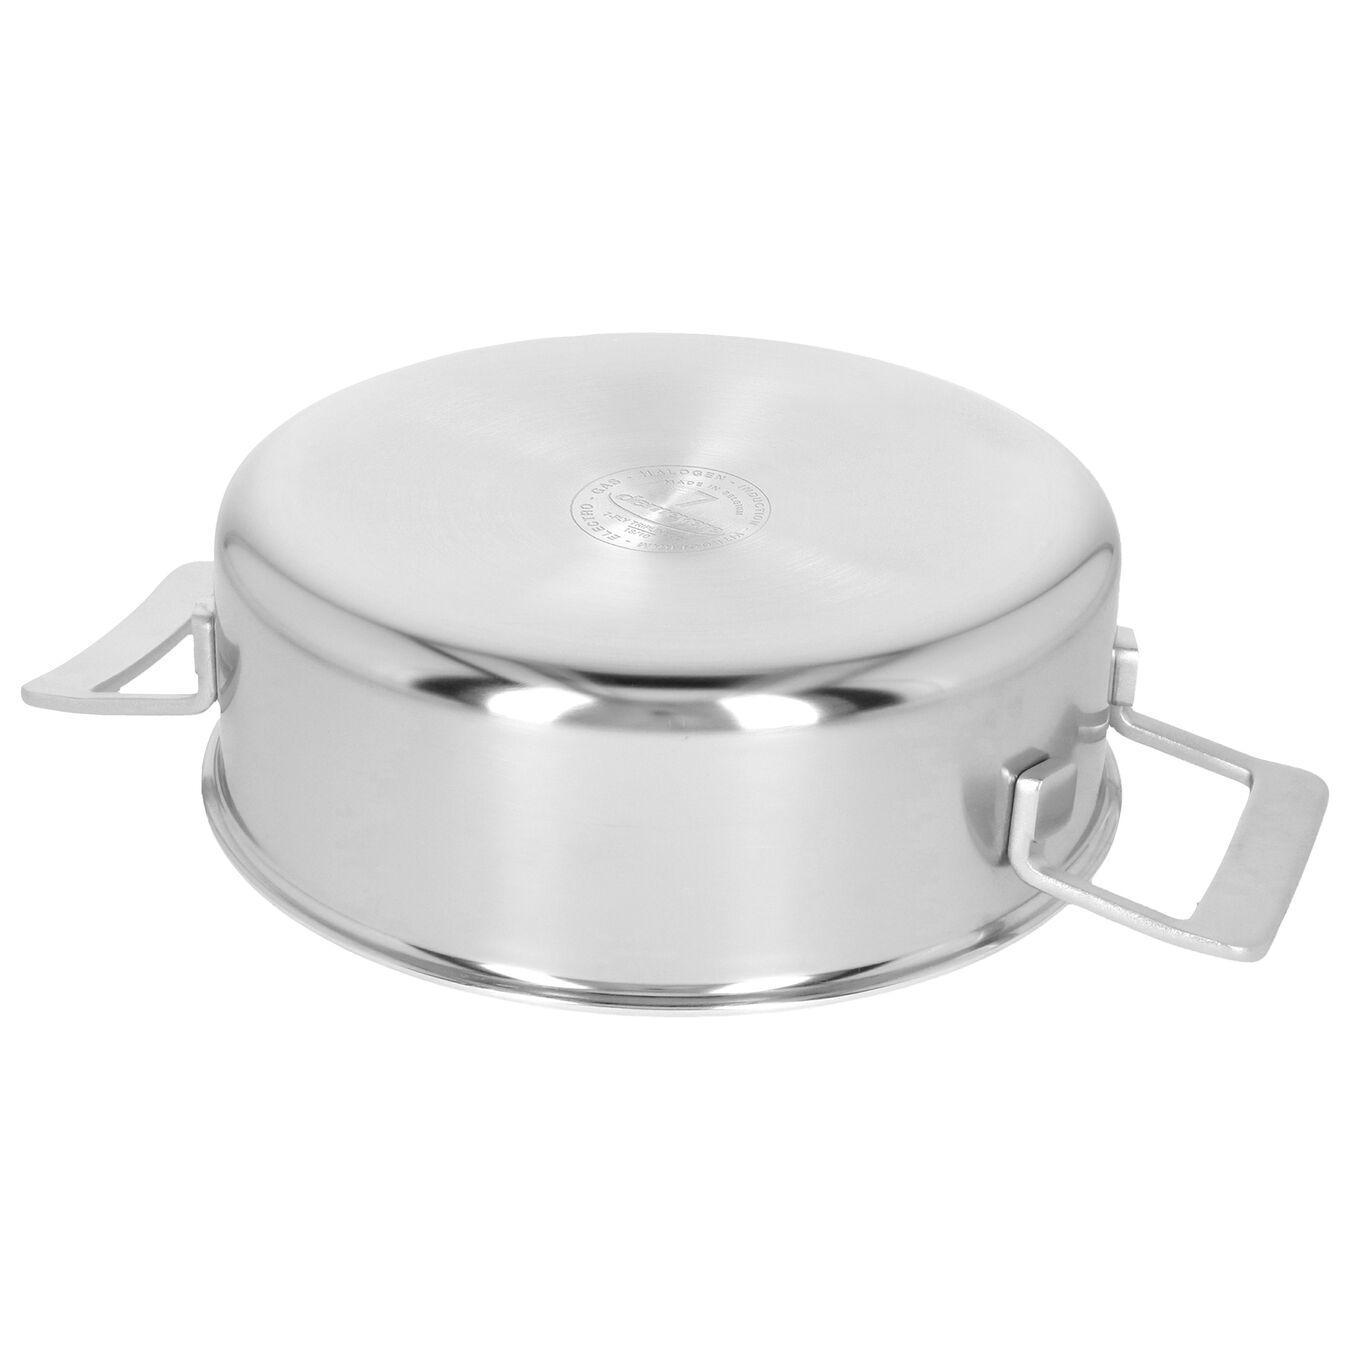 Kookpot met deksel, 24 cm / 3,8 l,,large 6